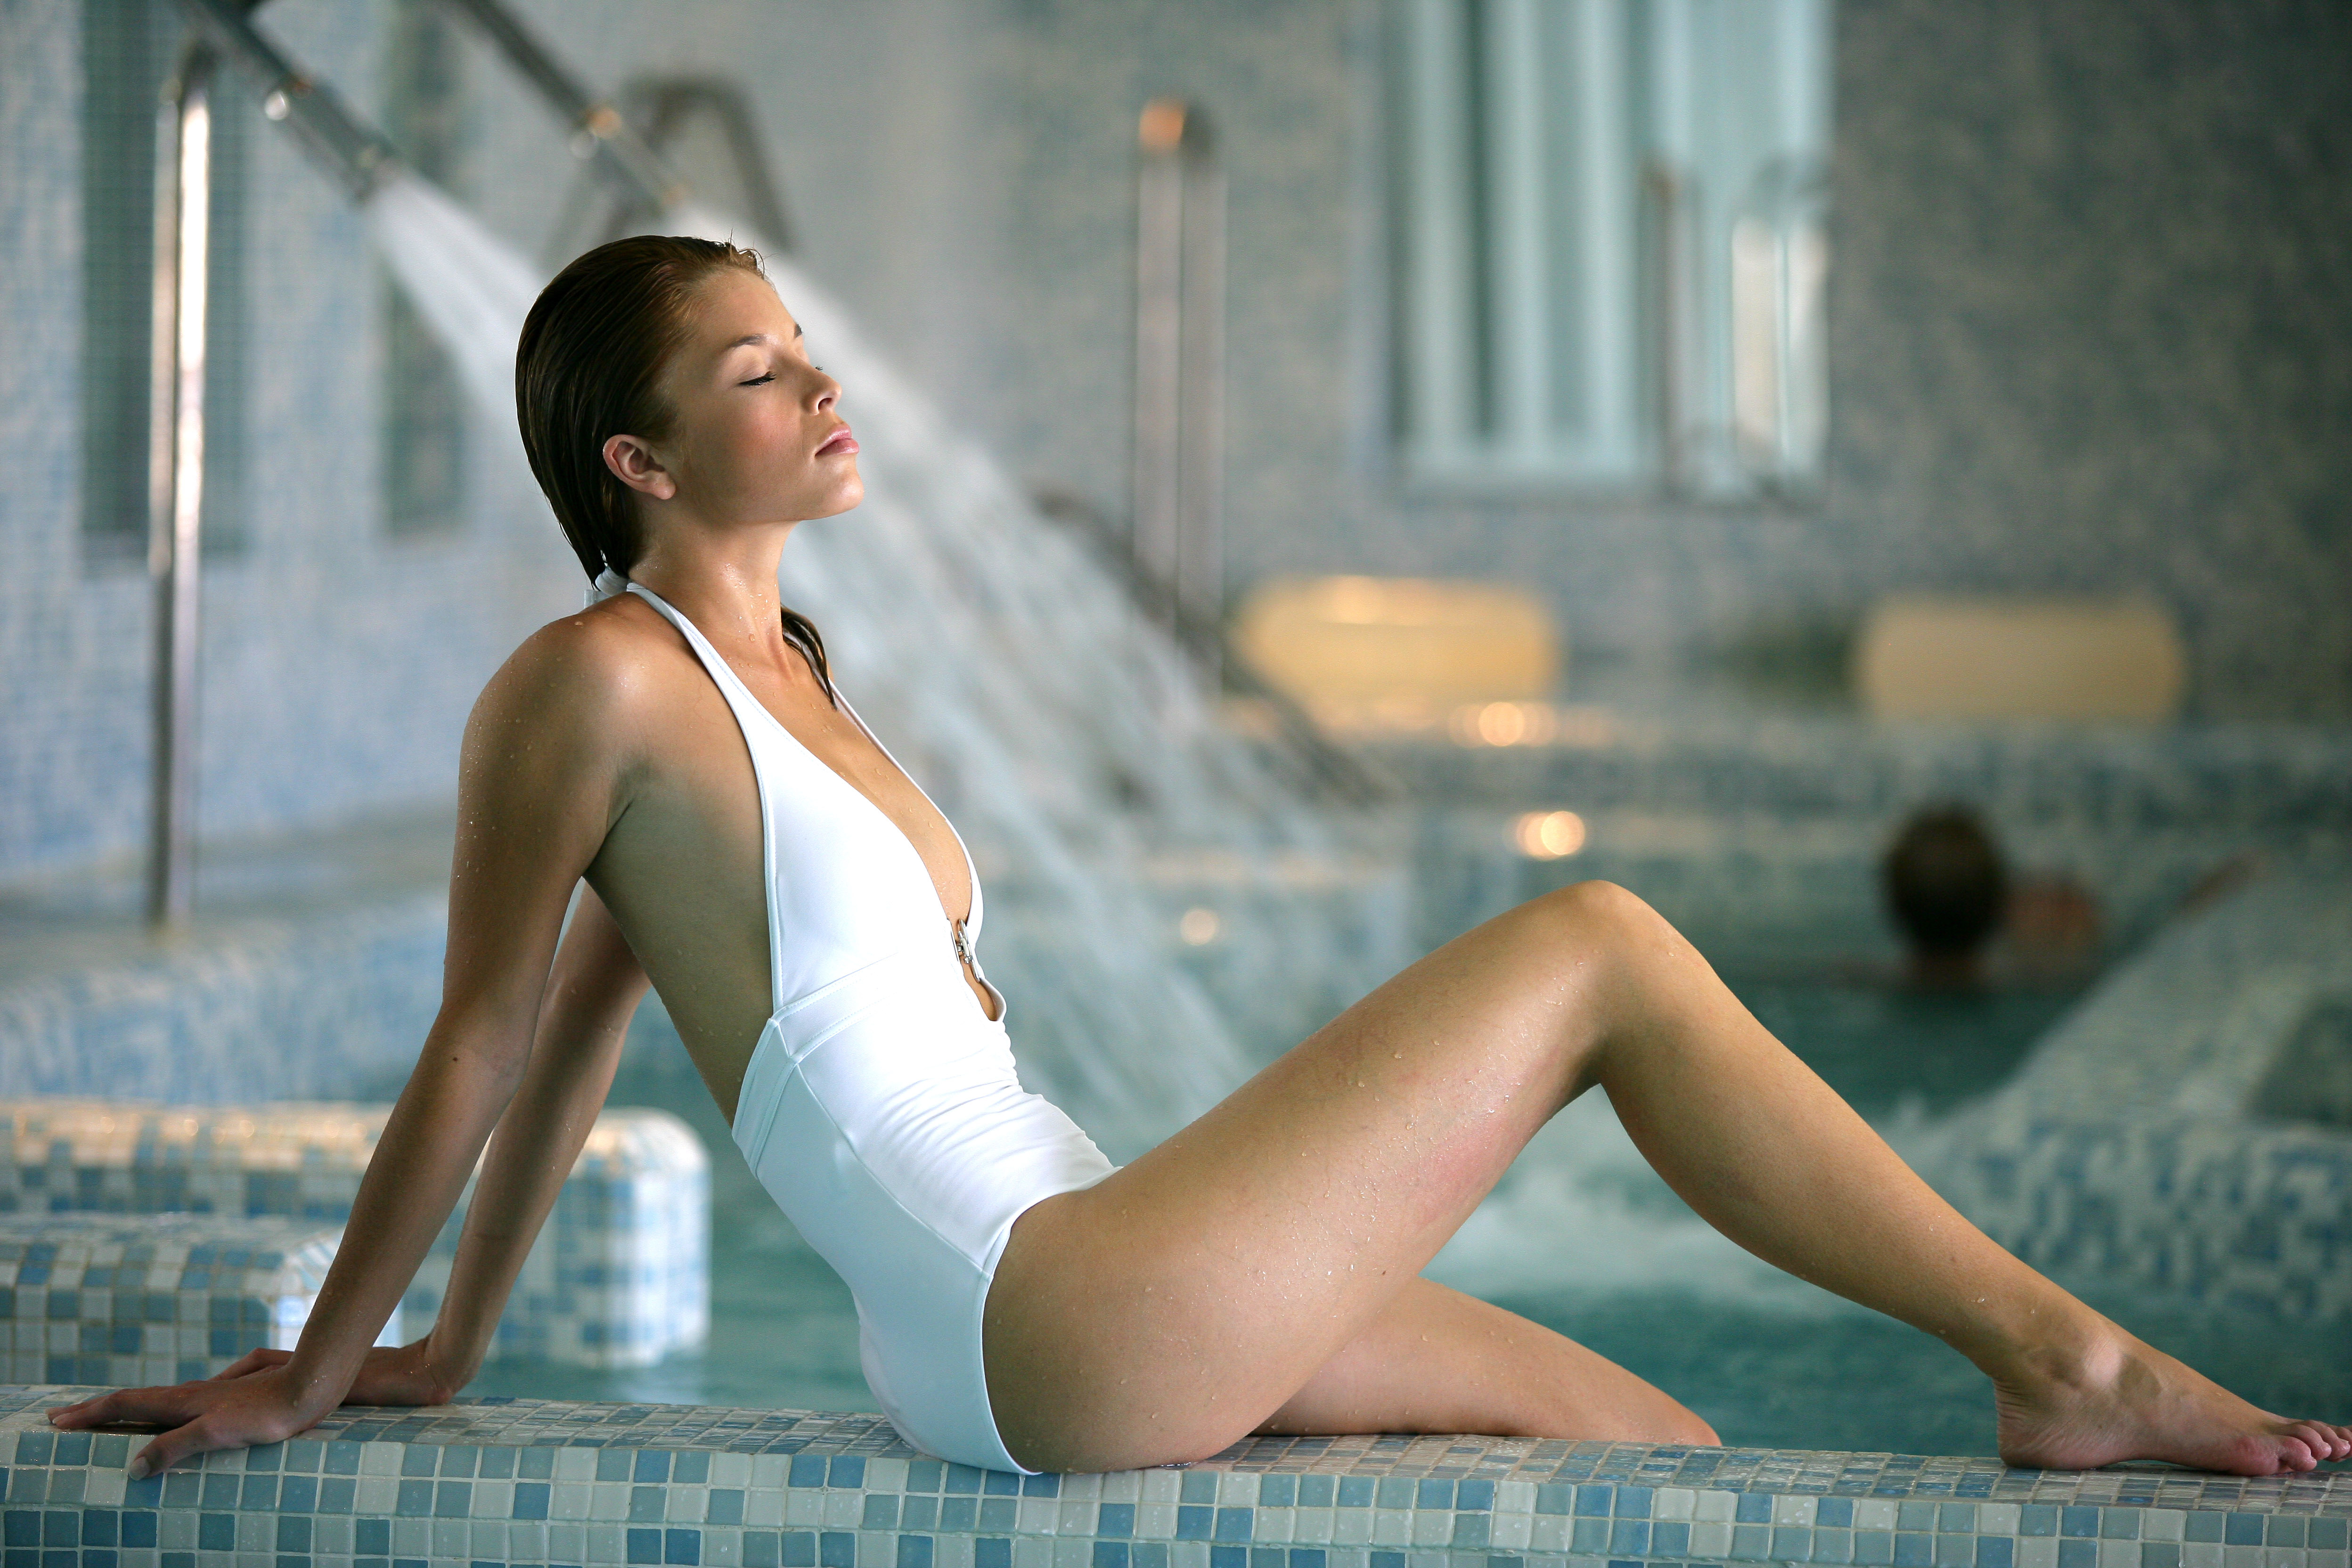 femme thalasso piscine jets